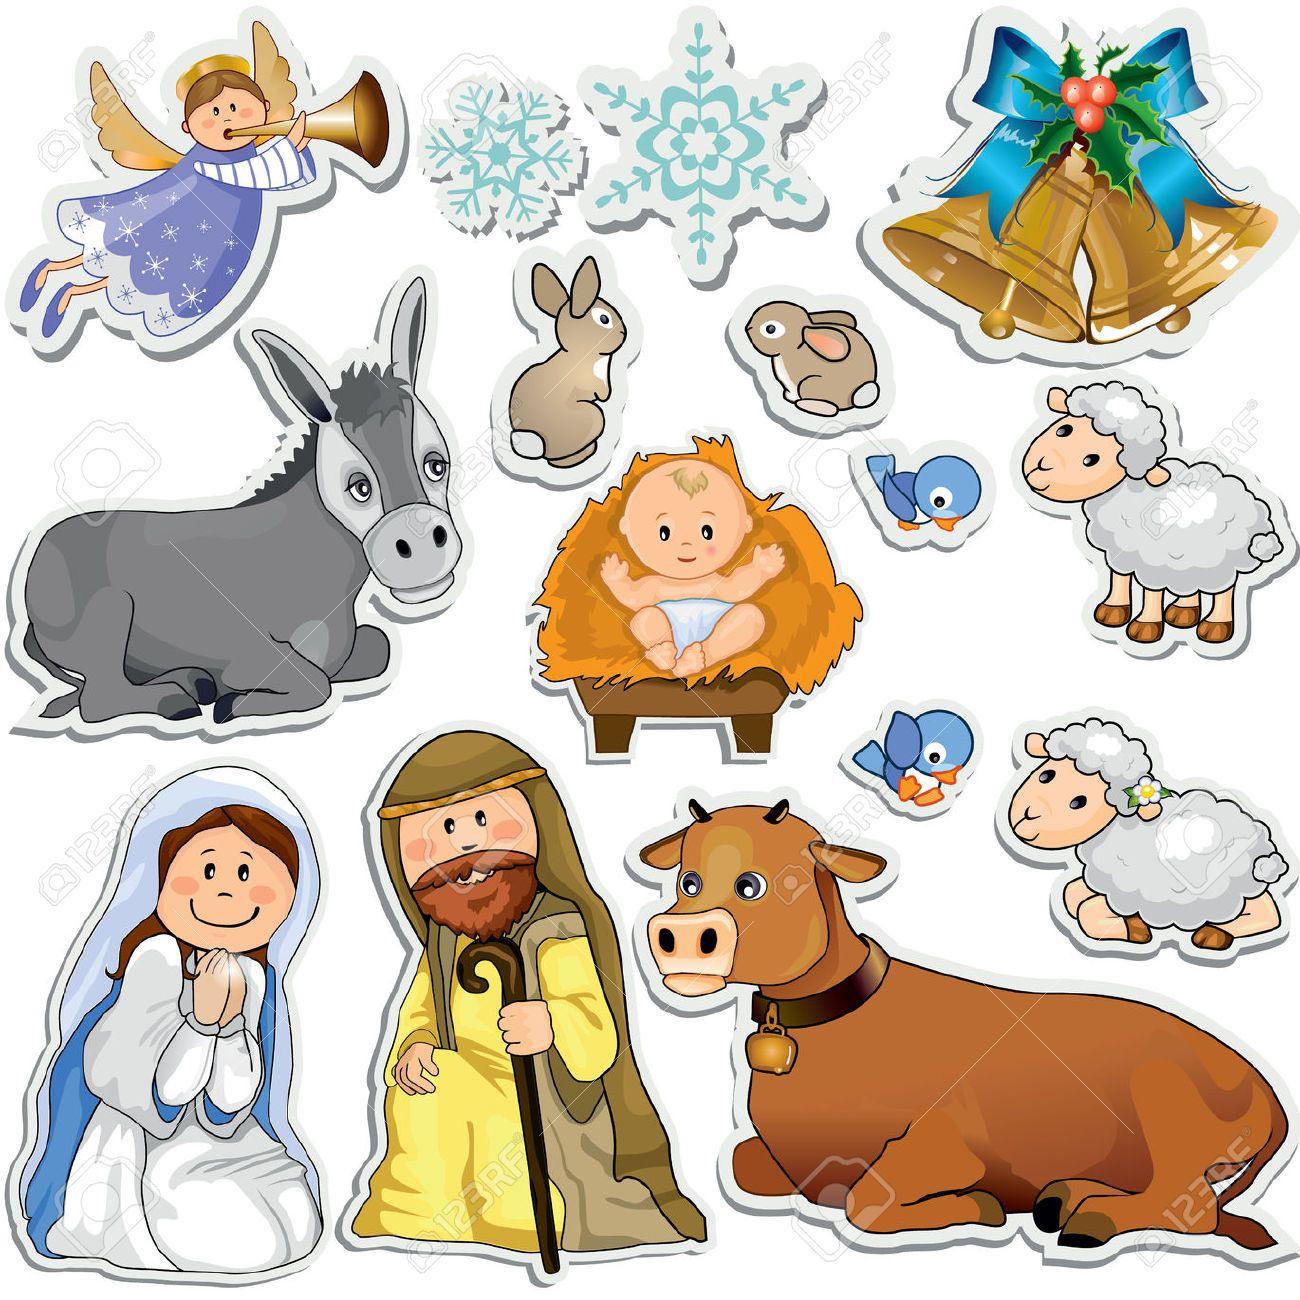 jogo do natal adesivos que representam os personagens da sagrada fam lia gradient m scara eps10 royalty free cliparts vetores e ilustra es stock  [ 1300 x 1300 Pixel ]